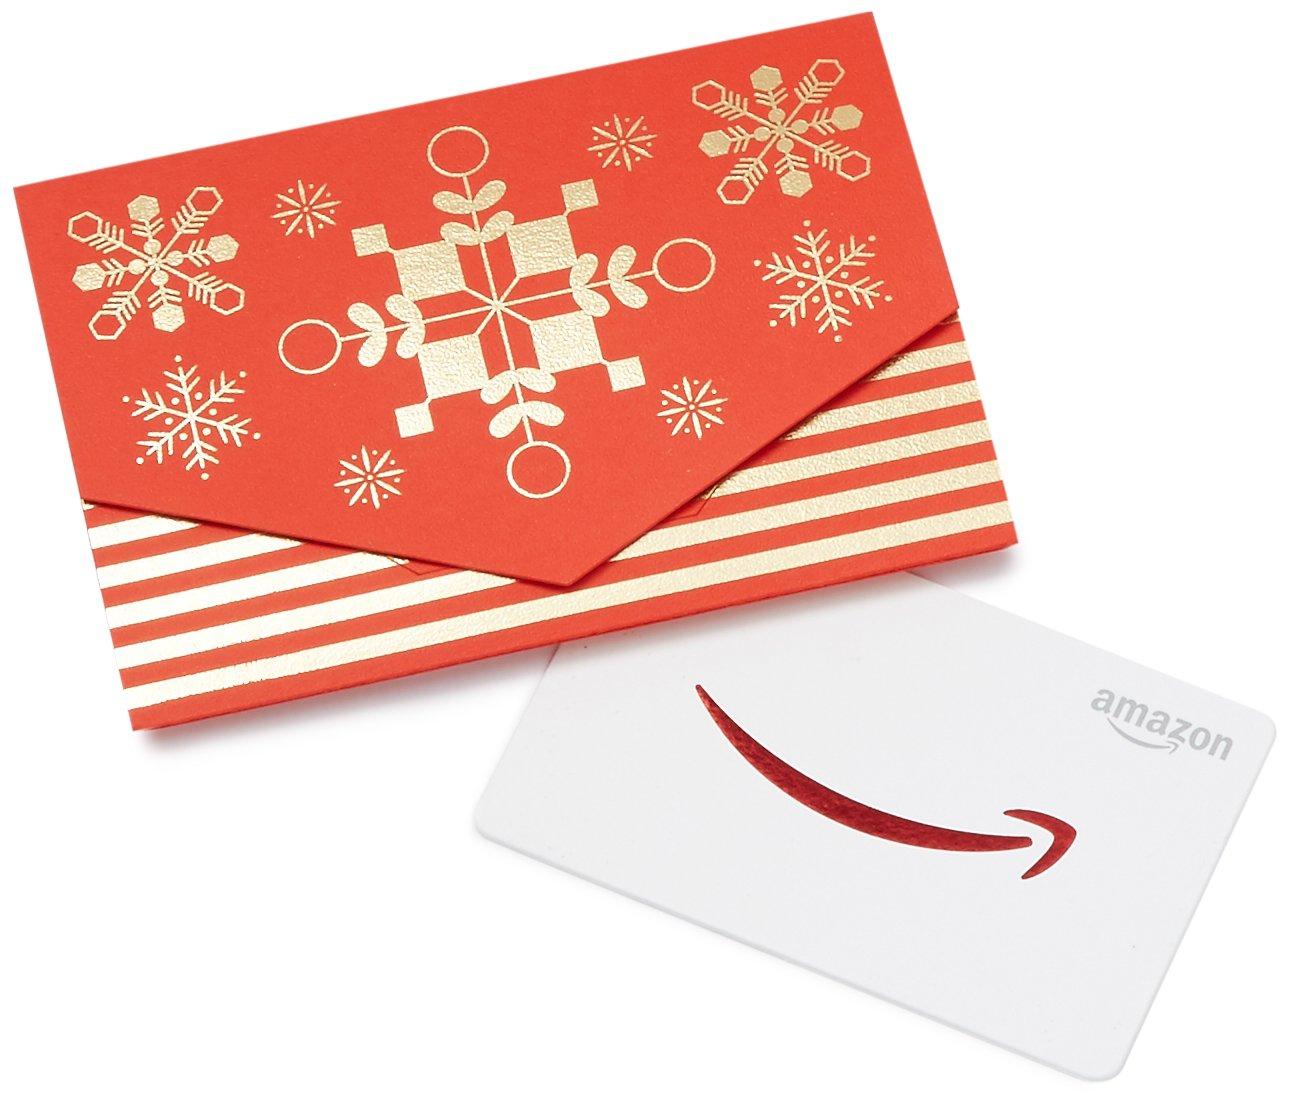 Amazon.com Gift Karte in a Mini Envelope